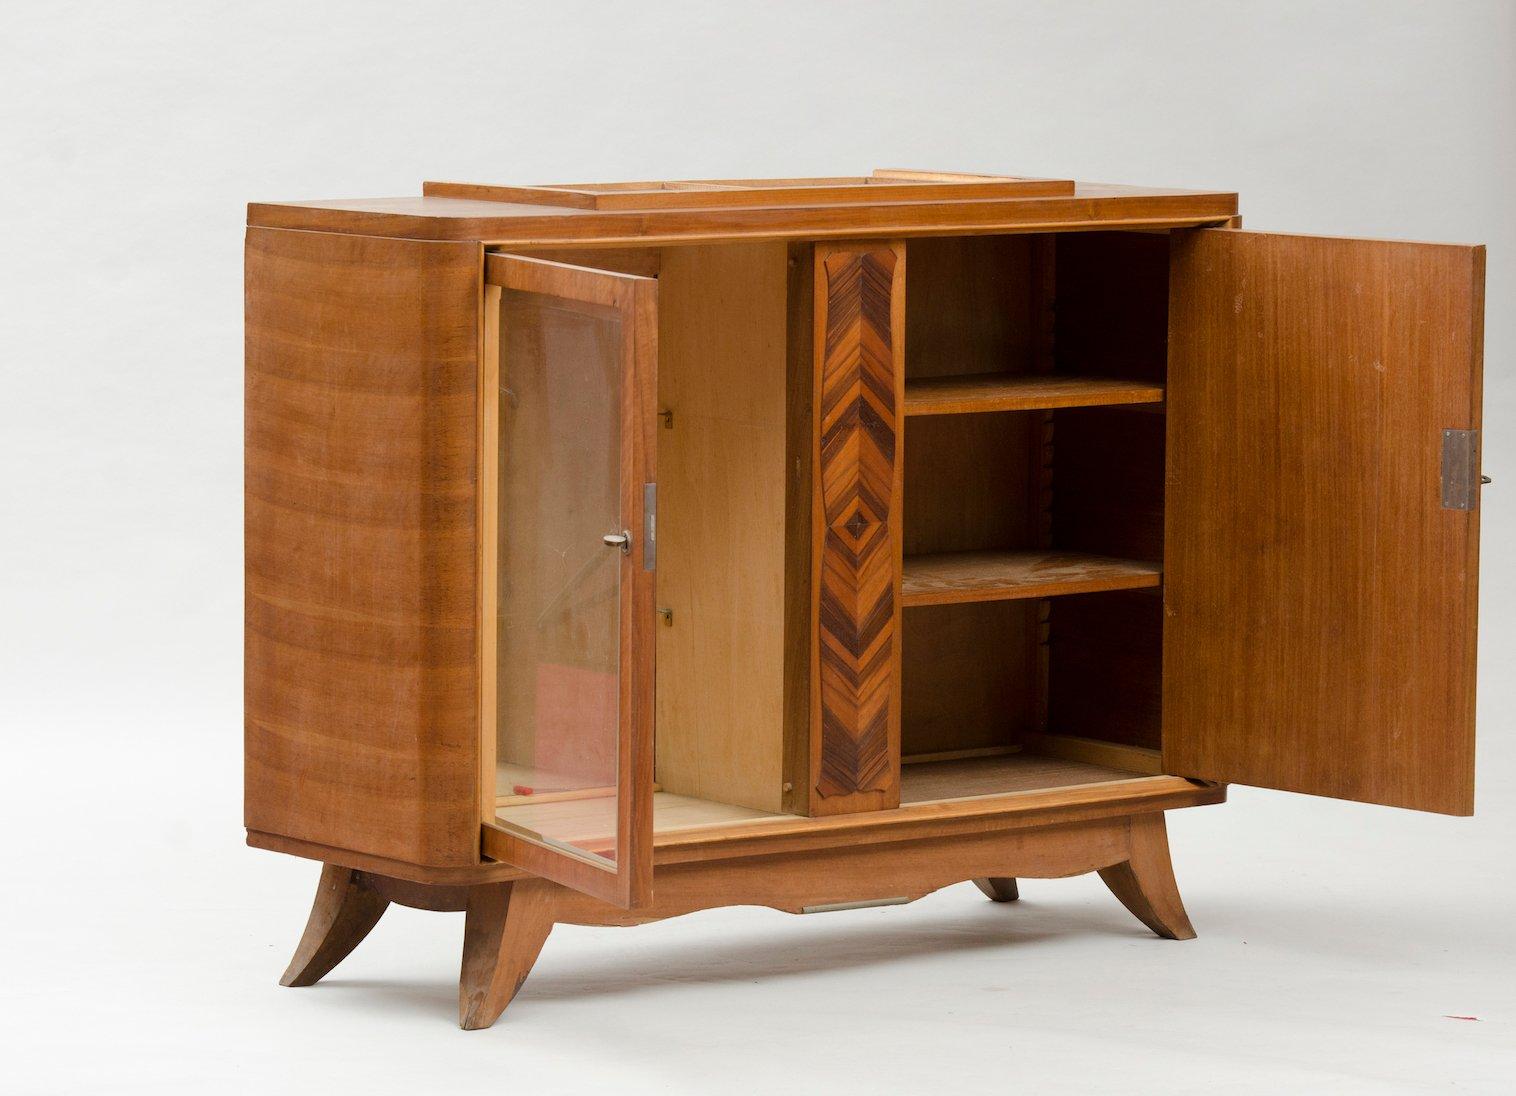 kleines vintage art deco sideboard bei pamono kaufen. Black Bedroom Furniture Sets. Home Design Ideas